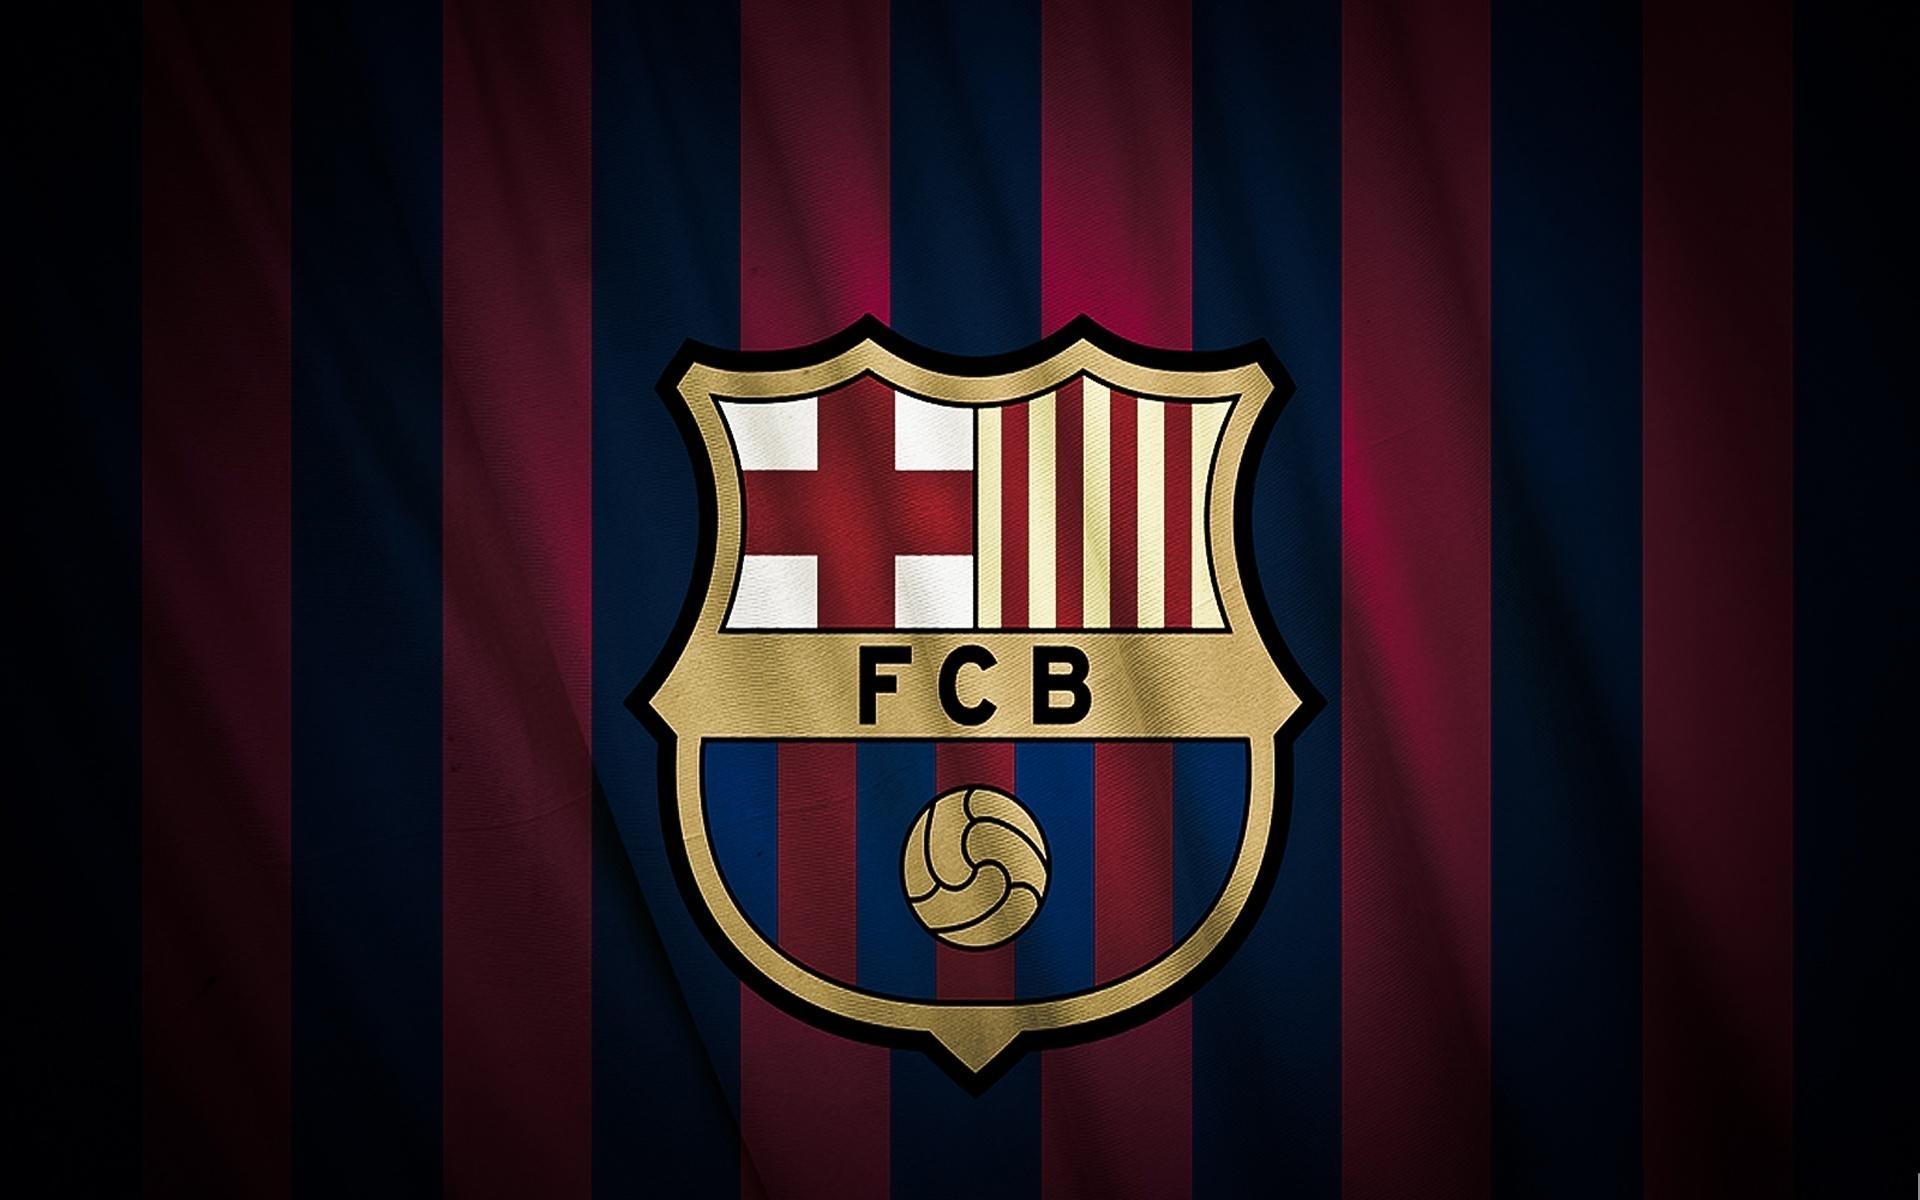 fc barcelona logo wallpaper download | pixelstalk